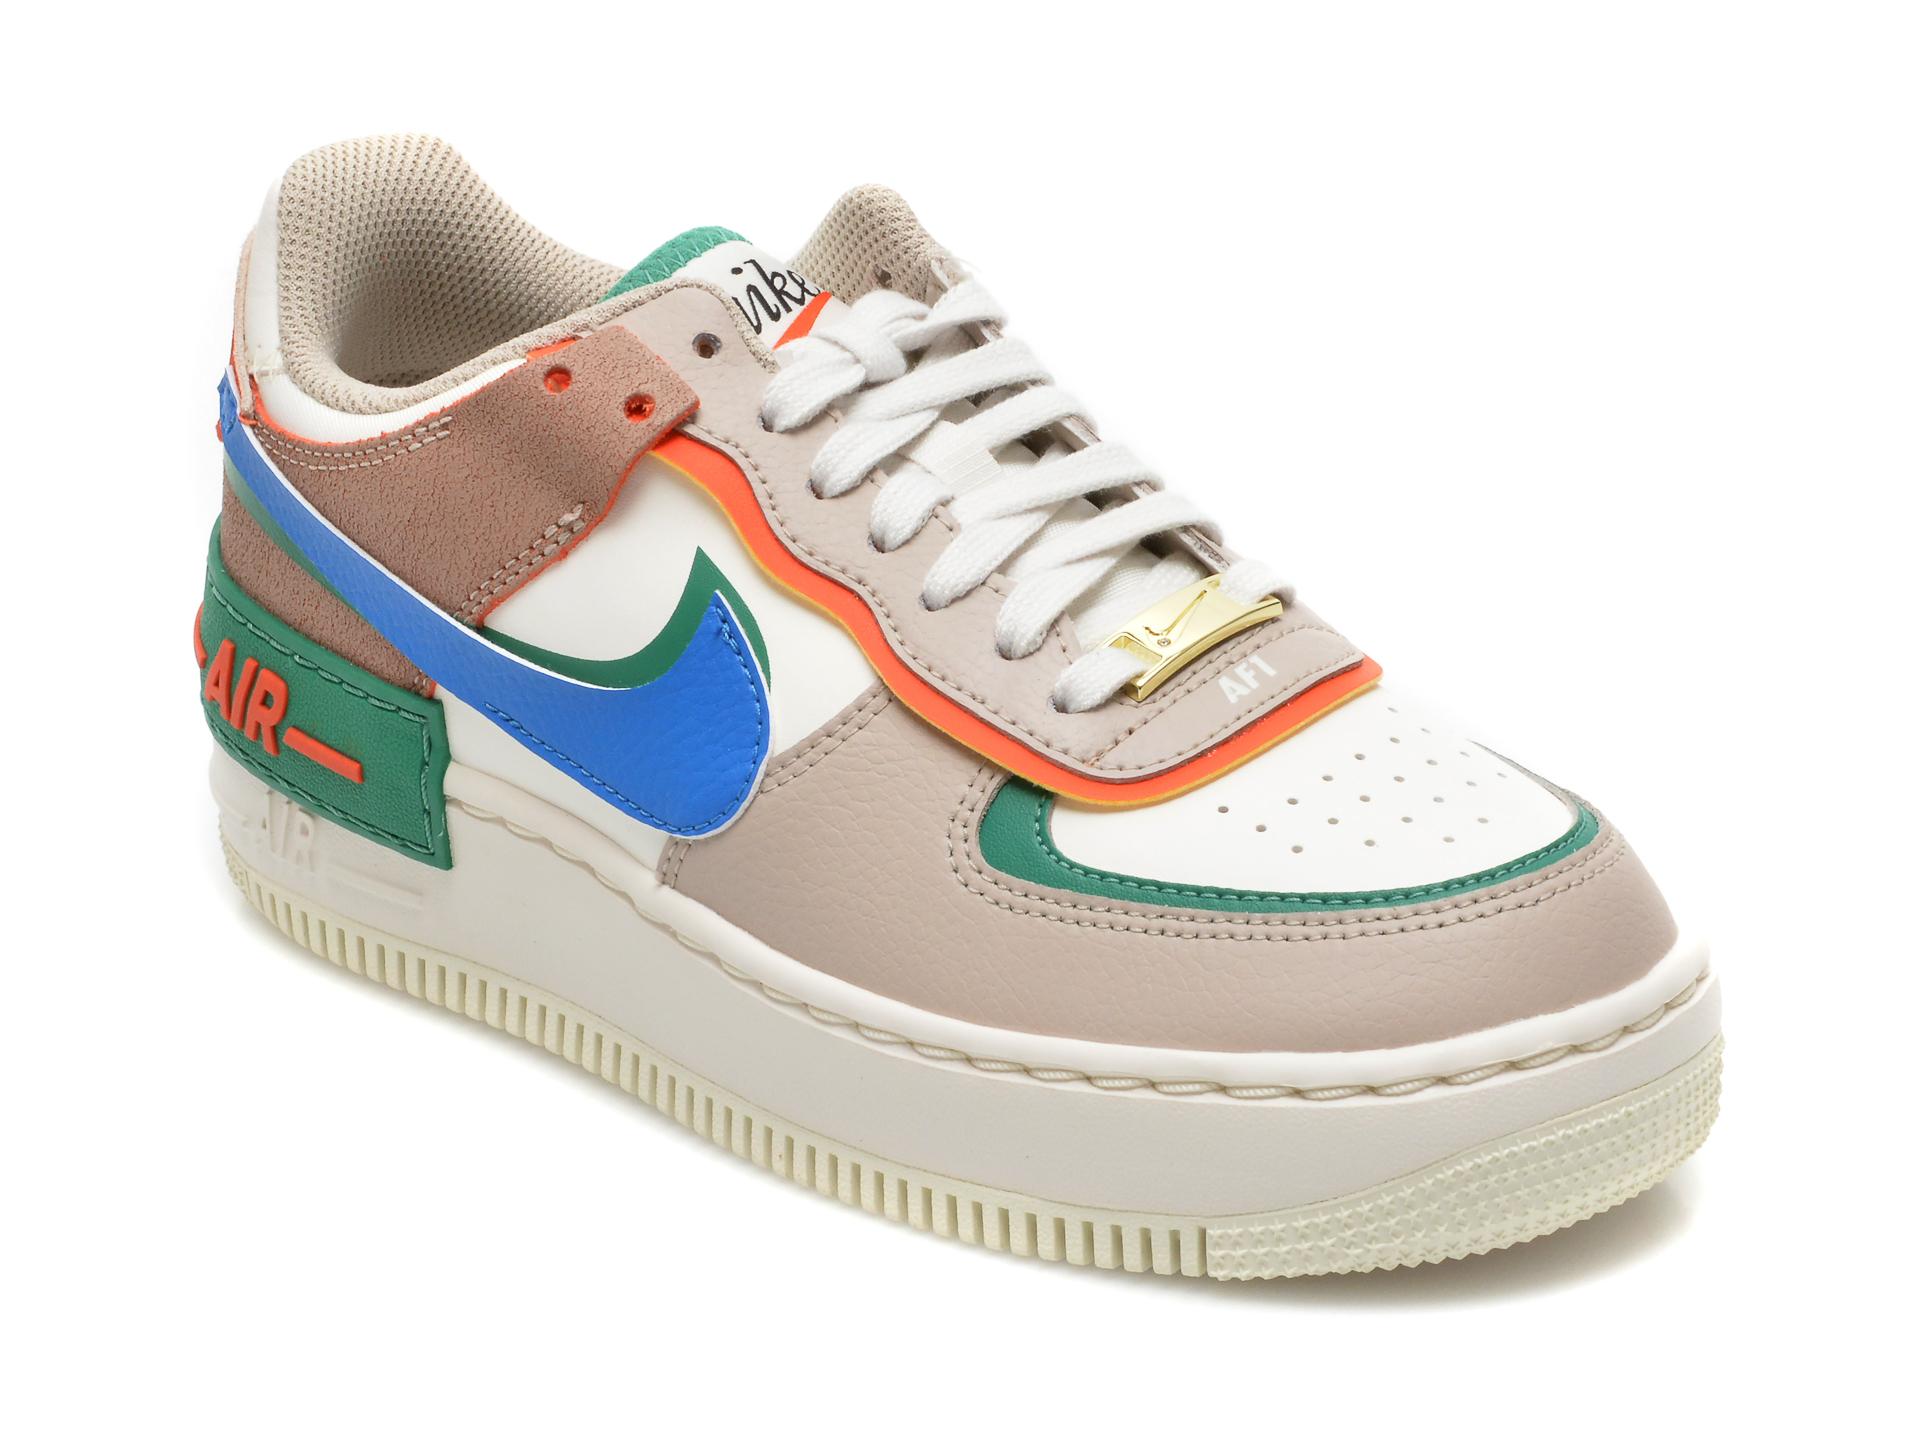 Pantofi sport NIKE multicolori, W AF1 SHADOW, din piele naturala imagine 2021 Nike